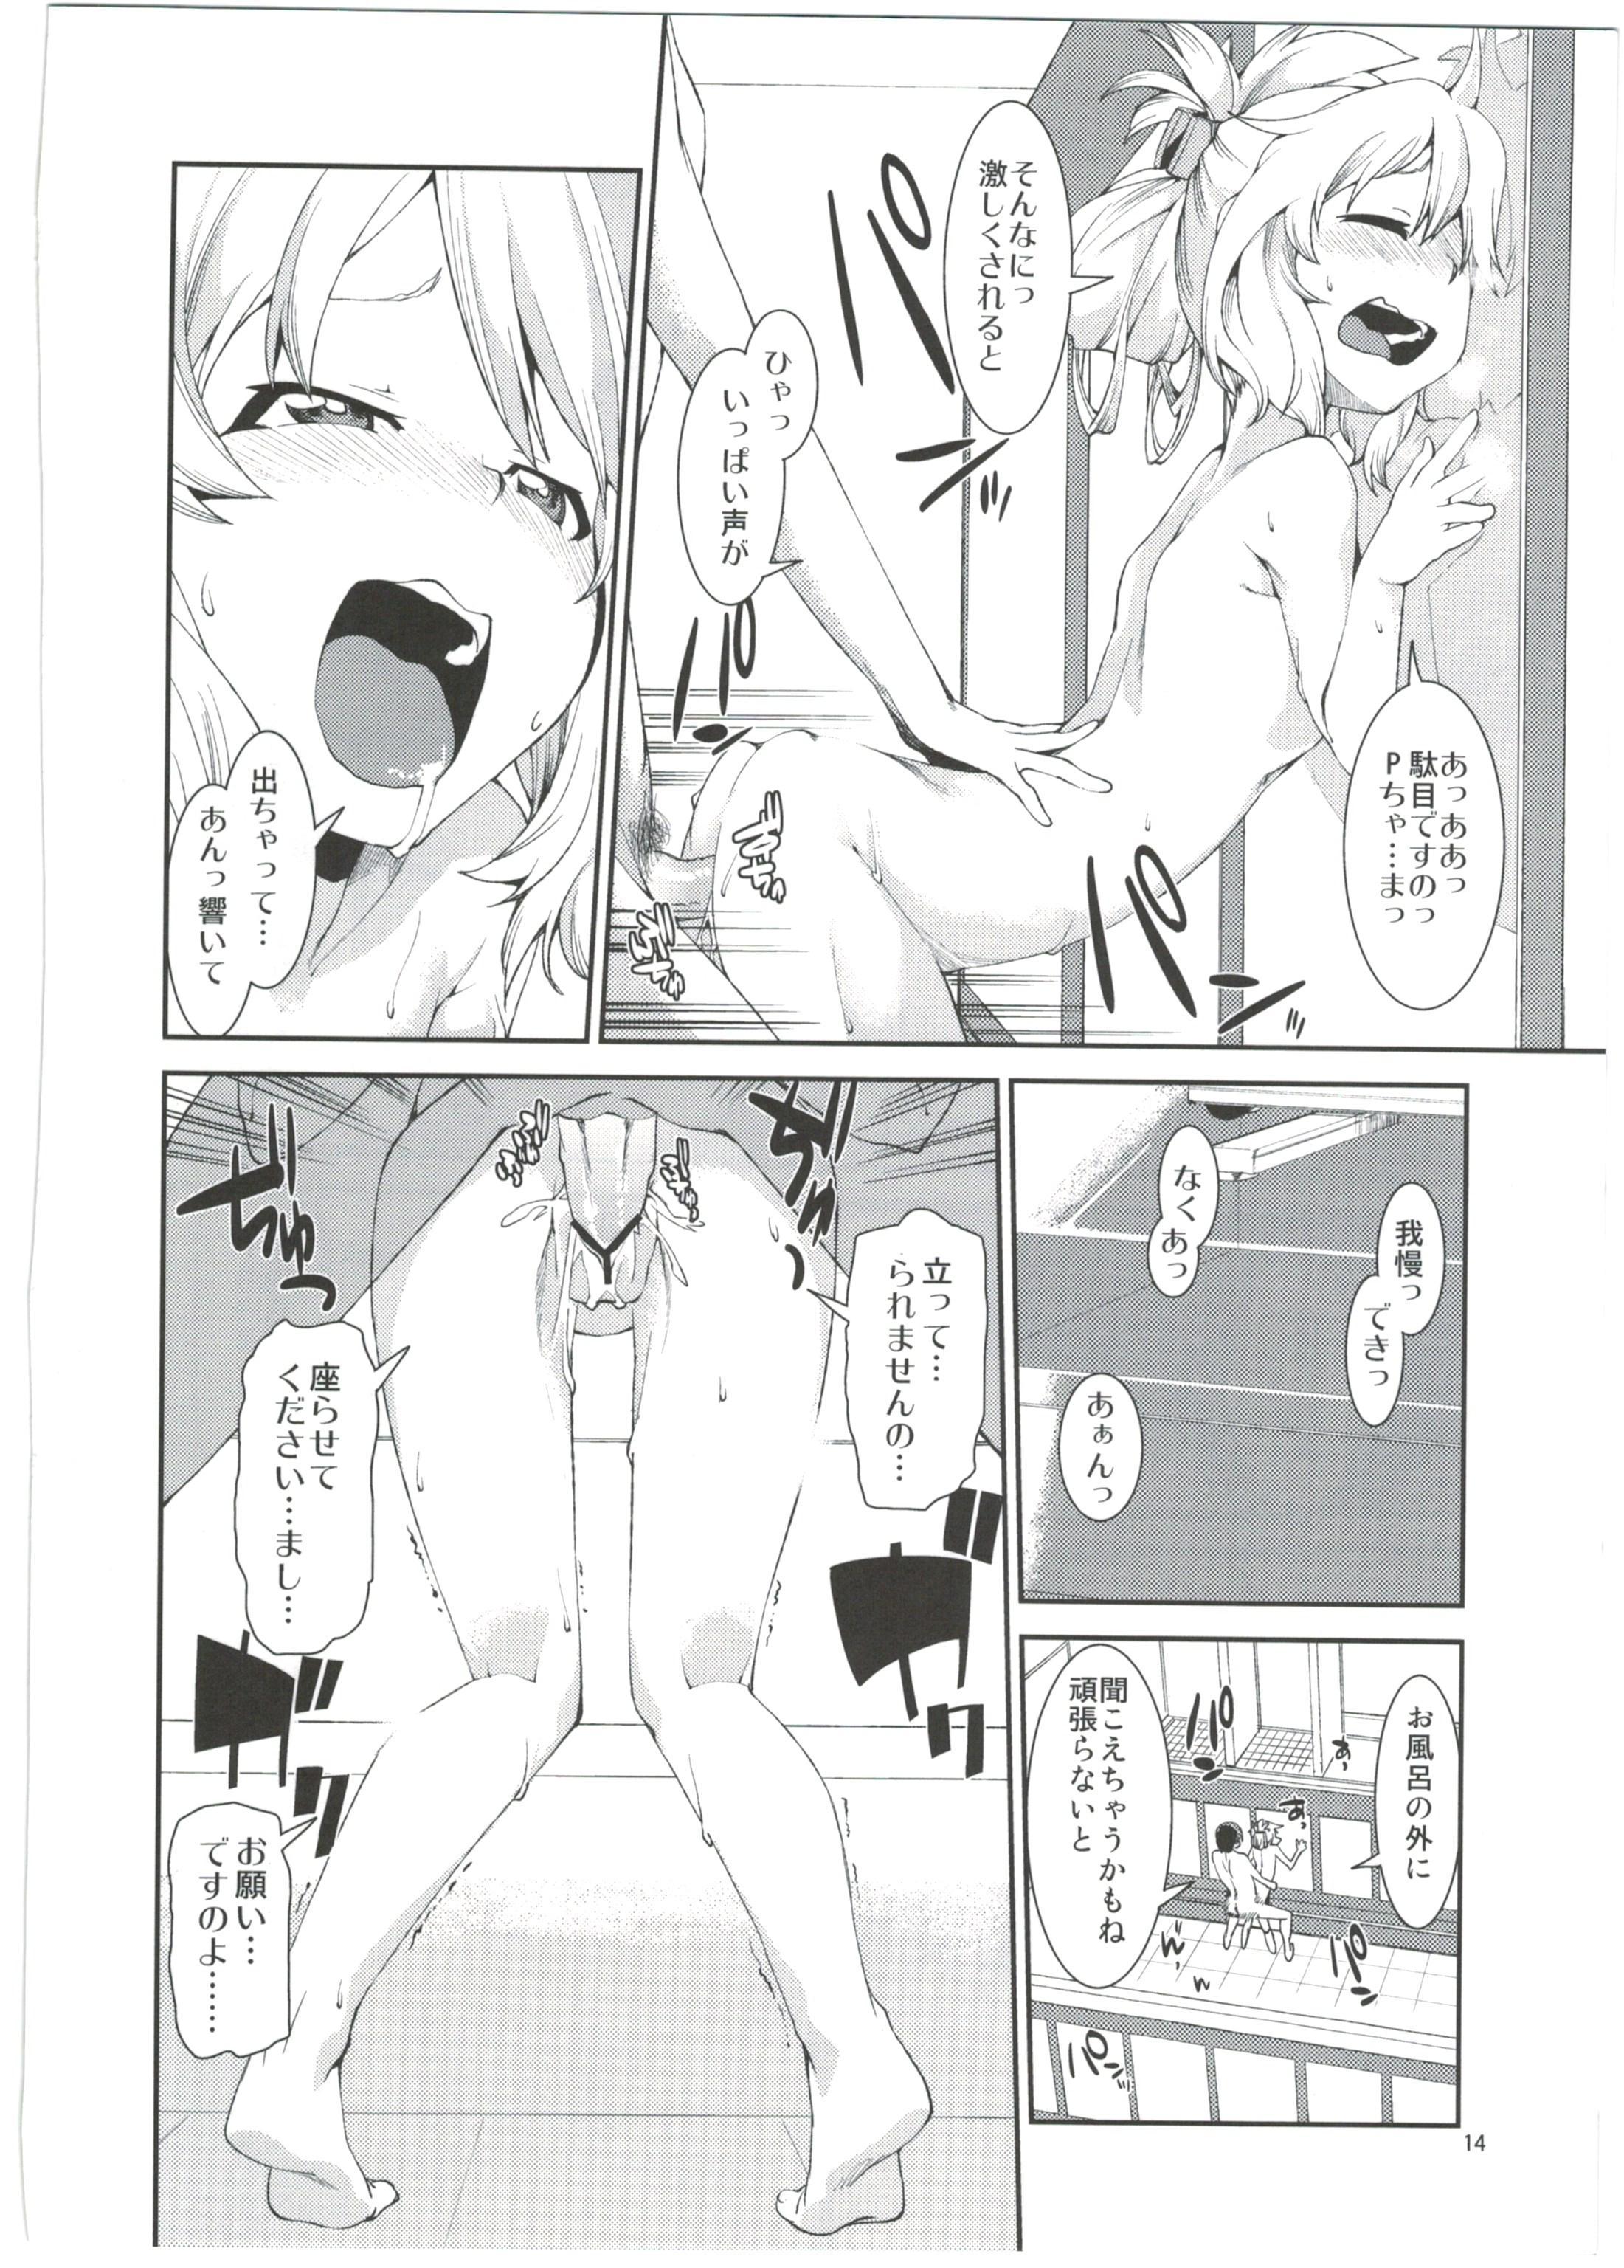 Momoka to Yukemuri Produce 15